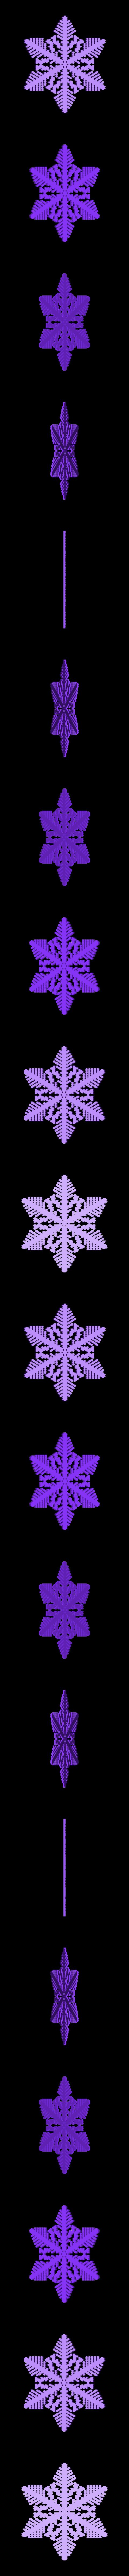 reiter40-var2.stl Download free STL file Snowflake growth simulation in BlocksCAD • 3D printing design, arpruss